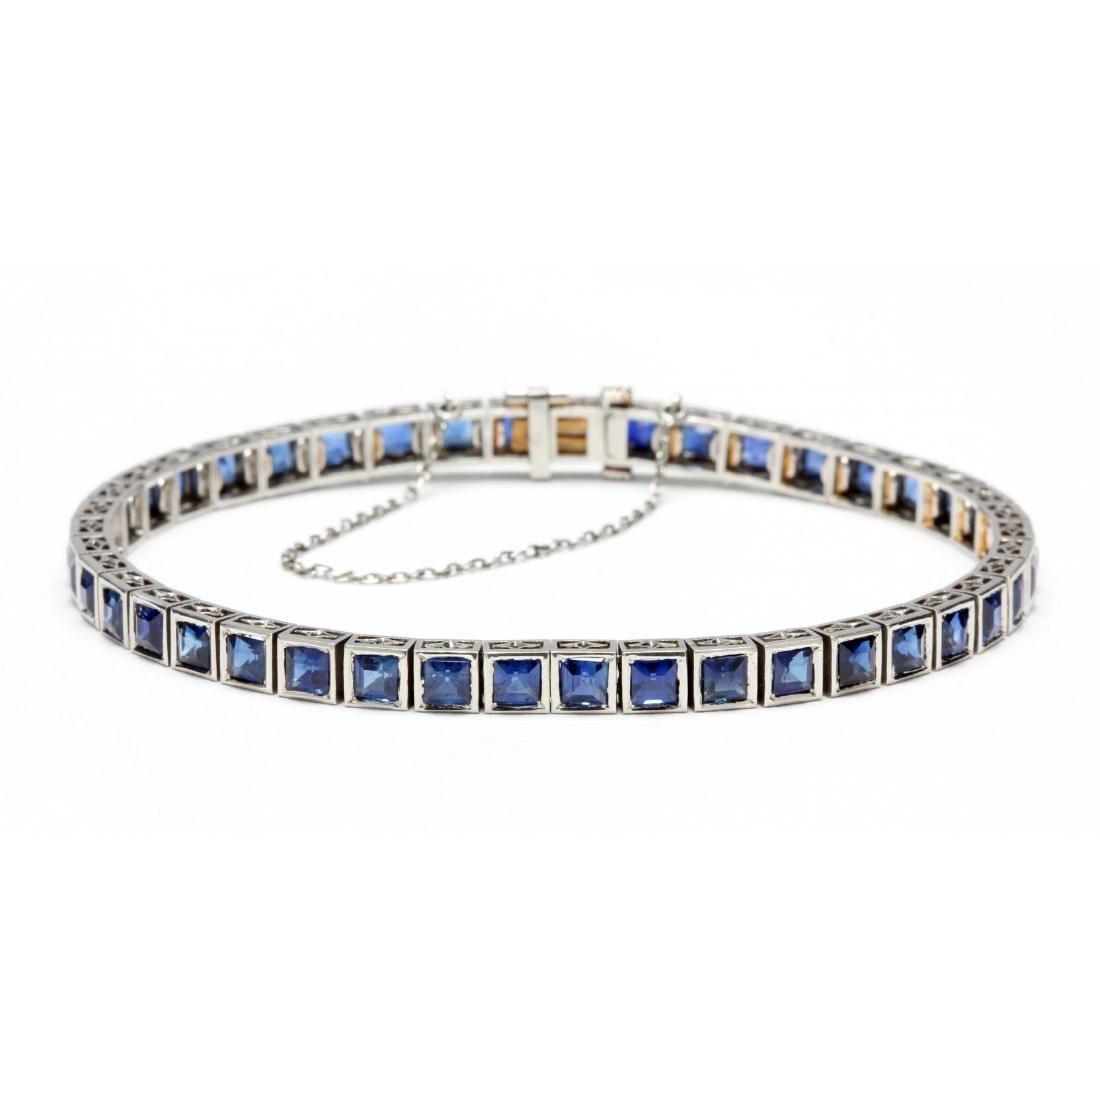 Art Deco Platinum and Sapphire Bracelet